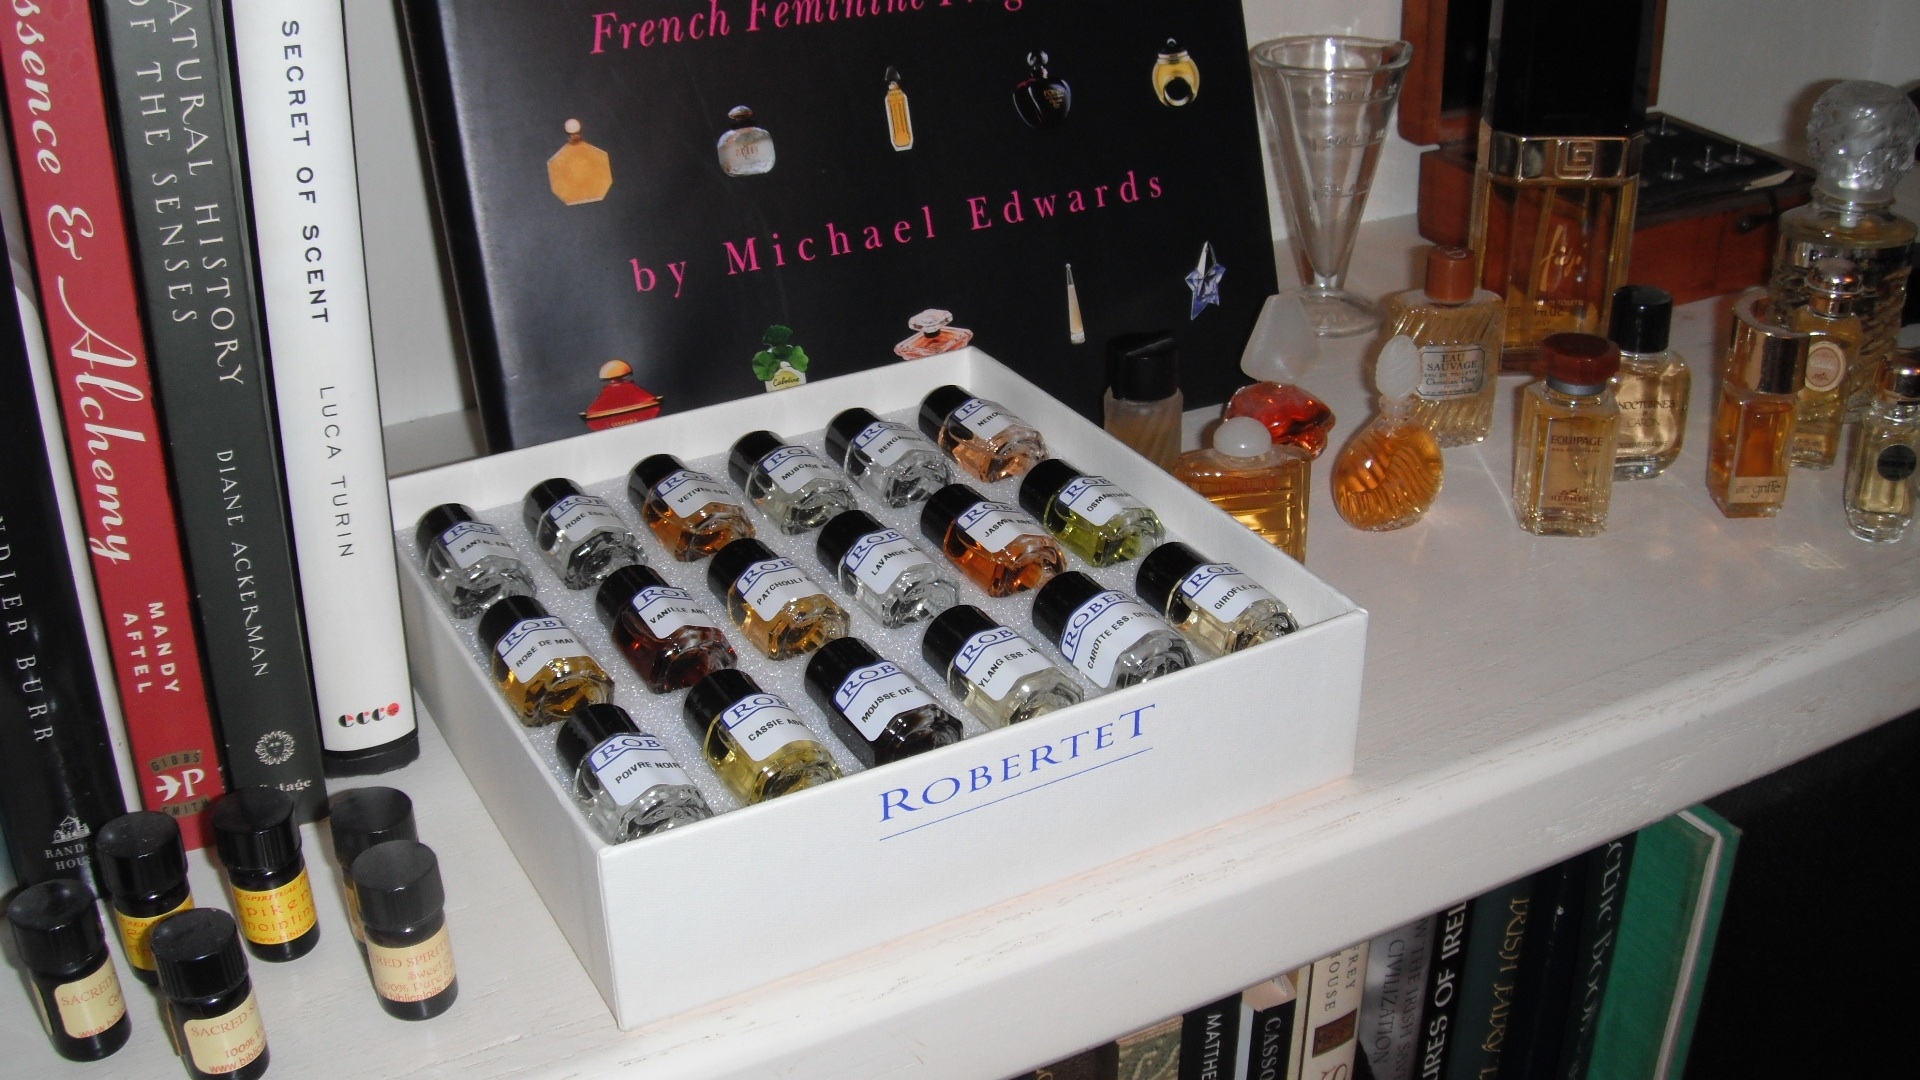 John Oehler bookshelf perfume books oil of anointing Exodus